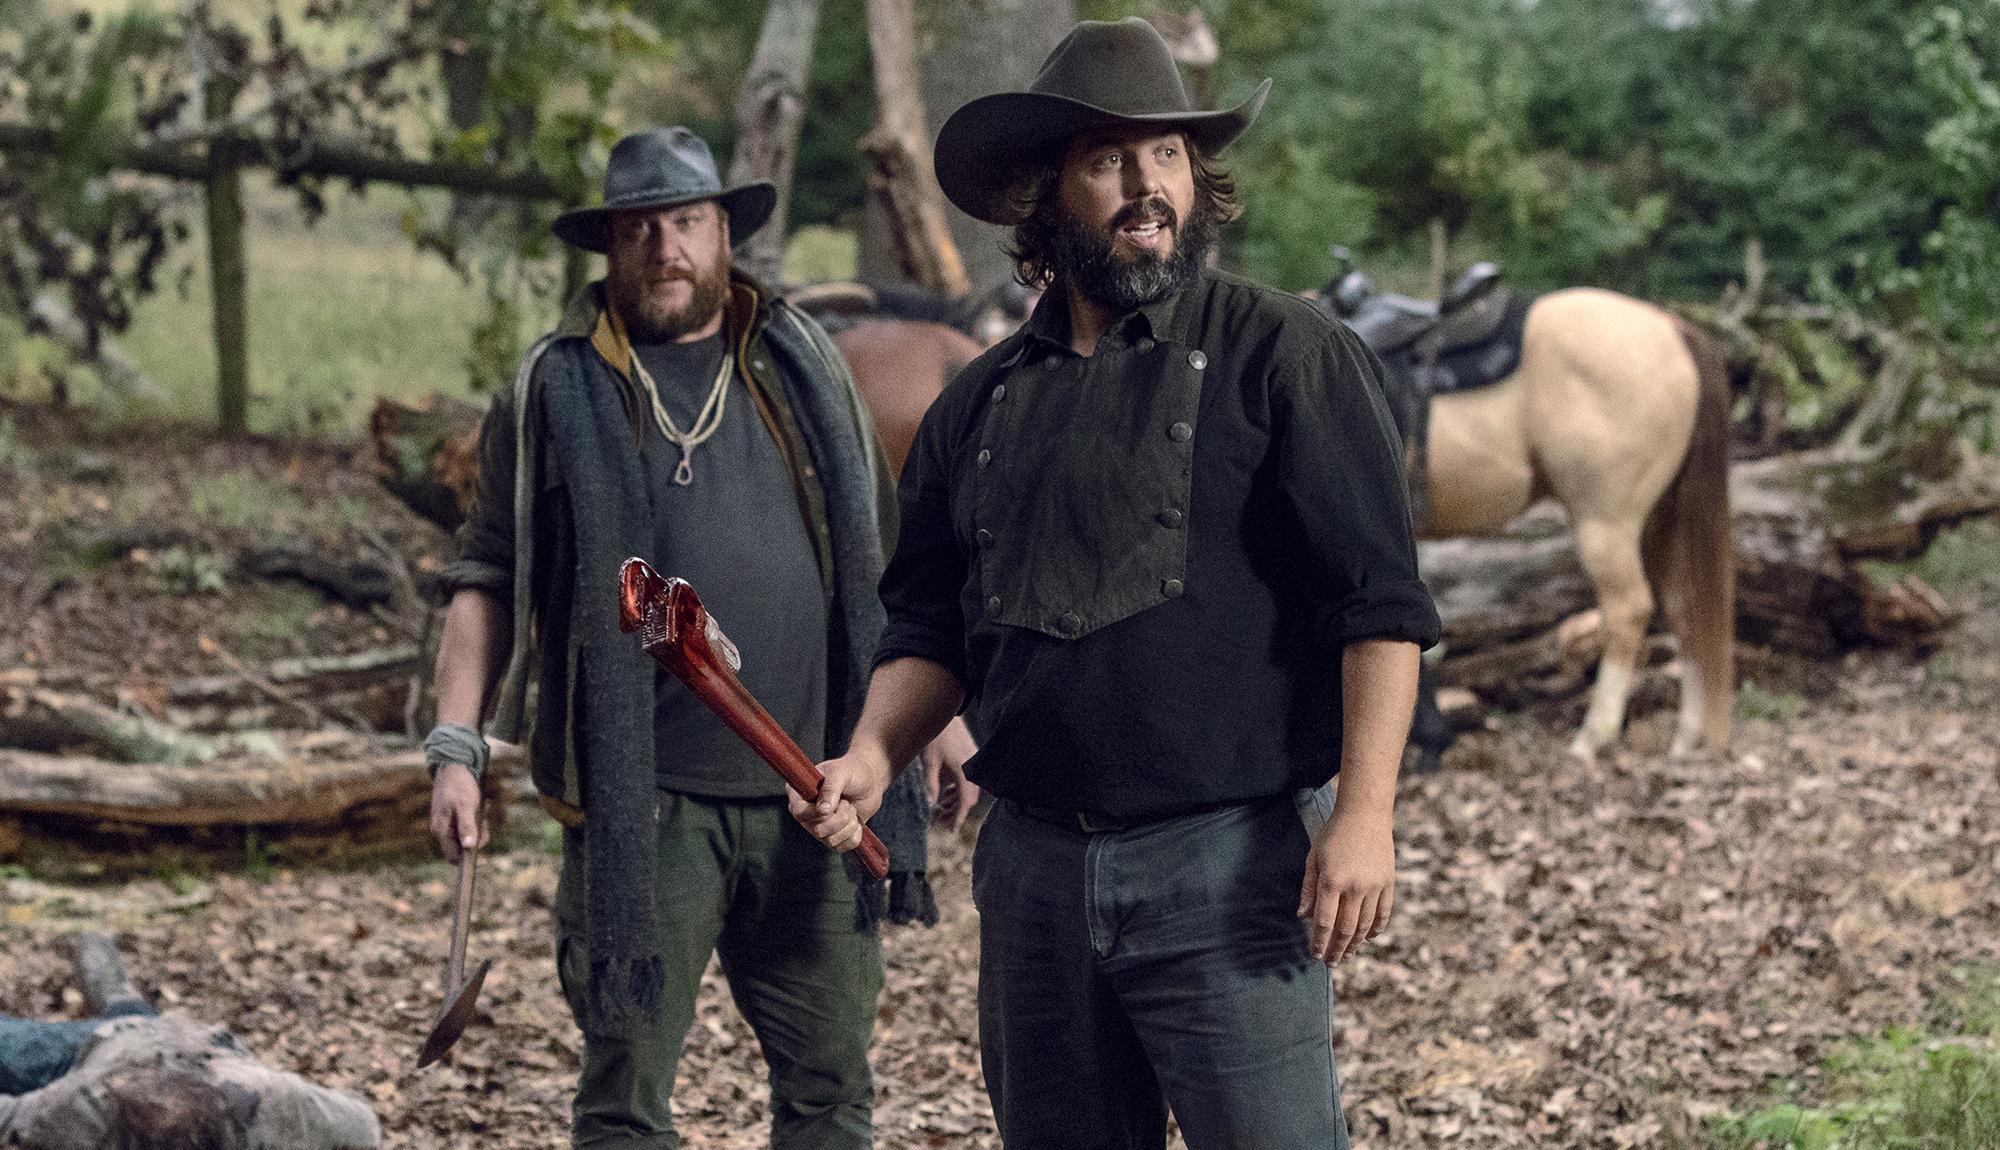 The Highwaymen Find Trouble In The Walking Dead Episode 915 Clip